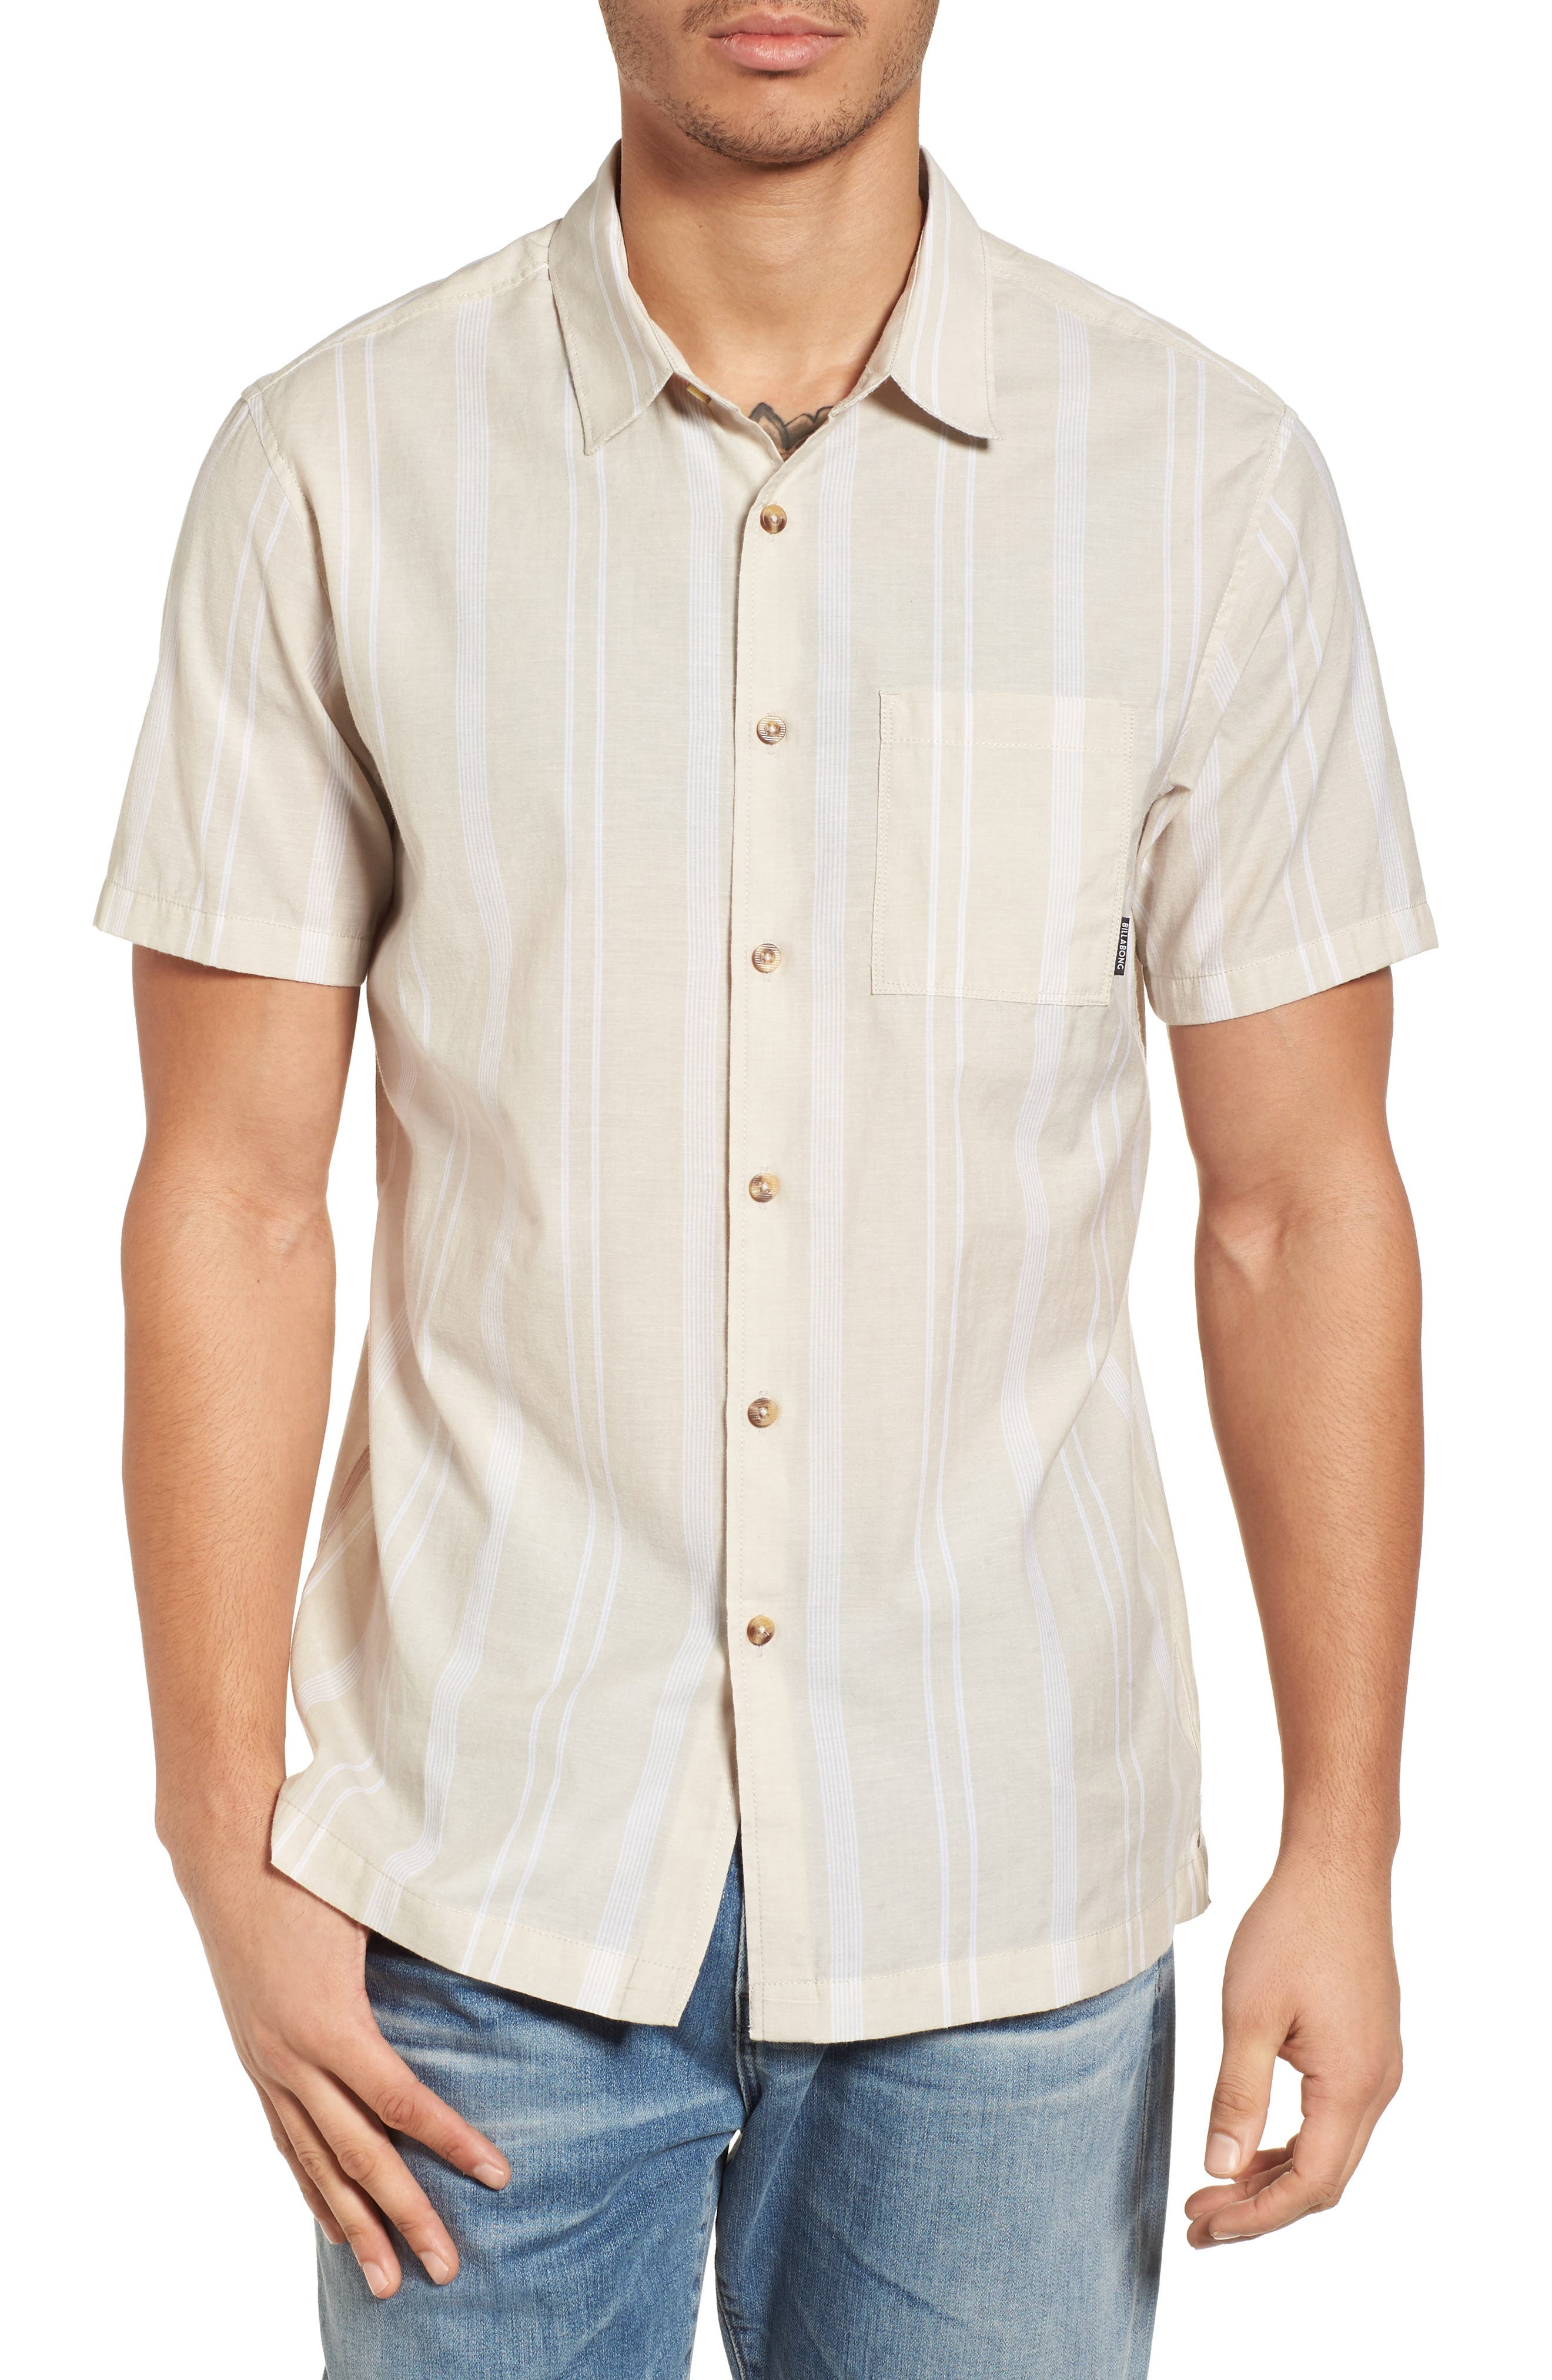 Donny Short Sleeve Shirt,                             Main thumbnail 1, color,                             Sand